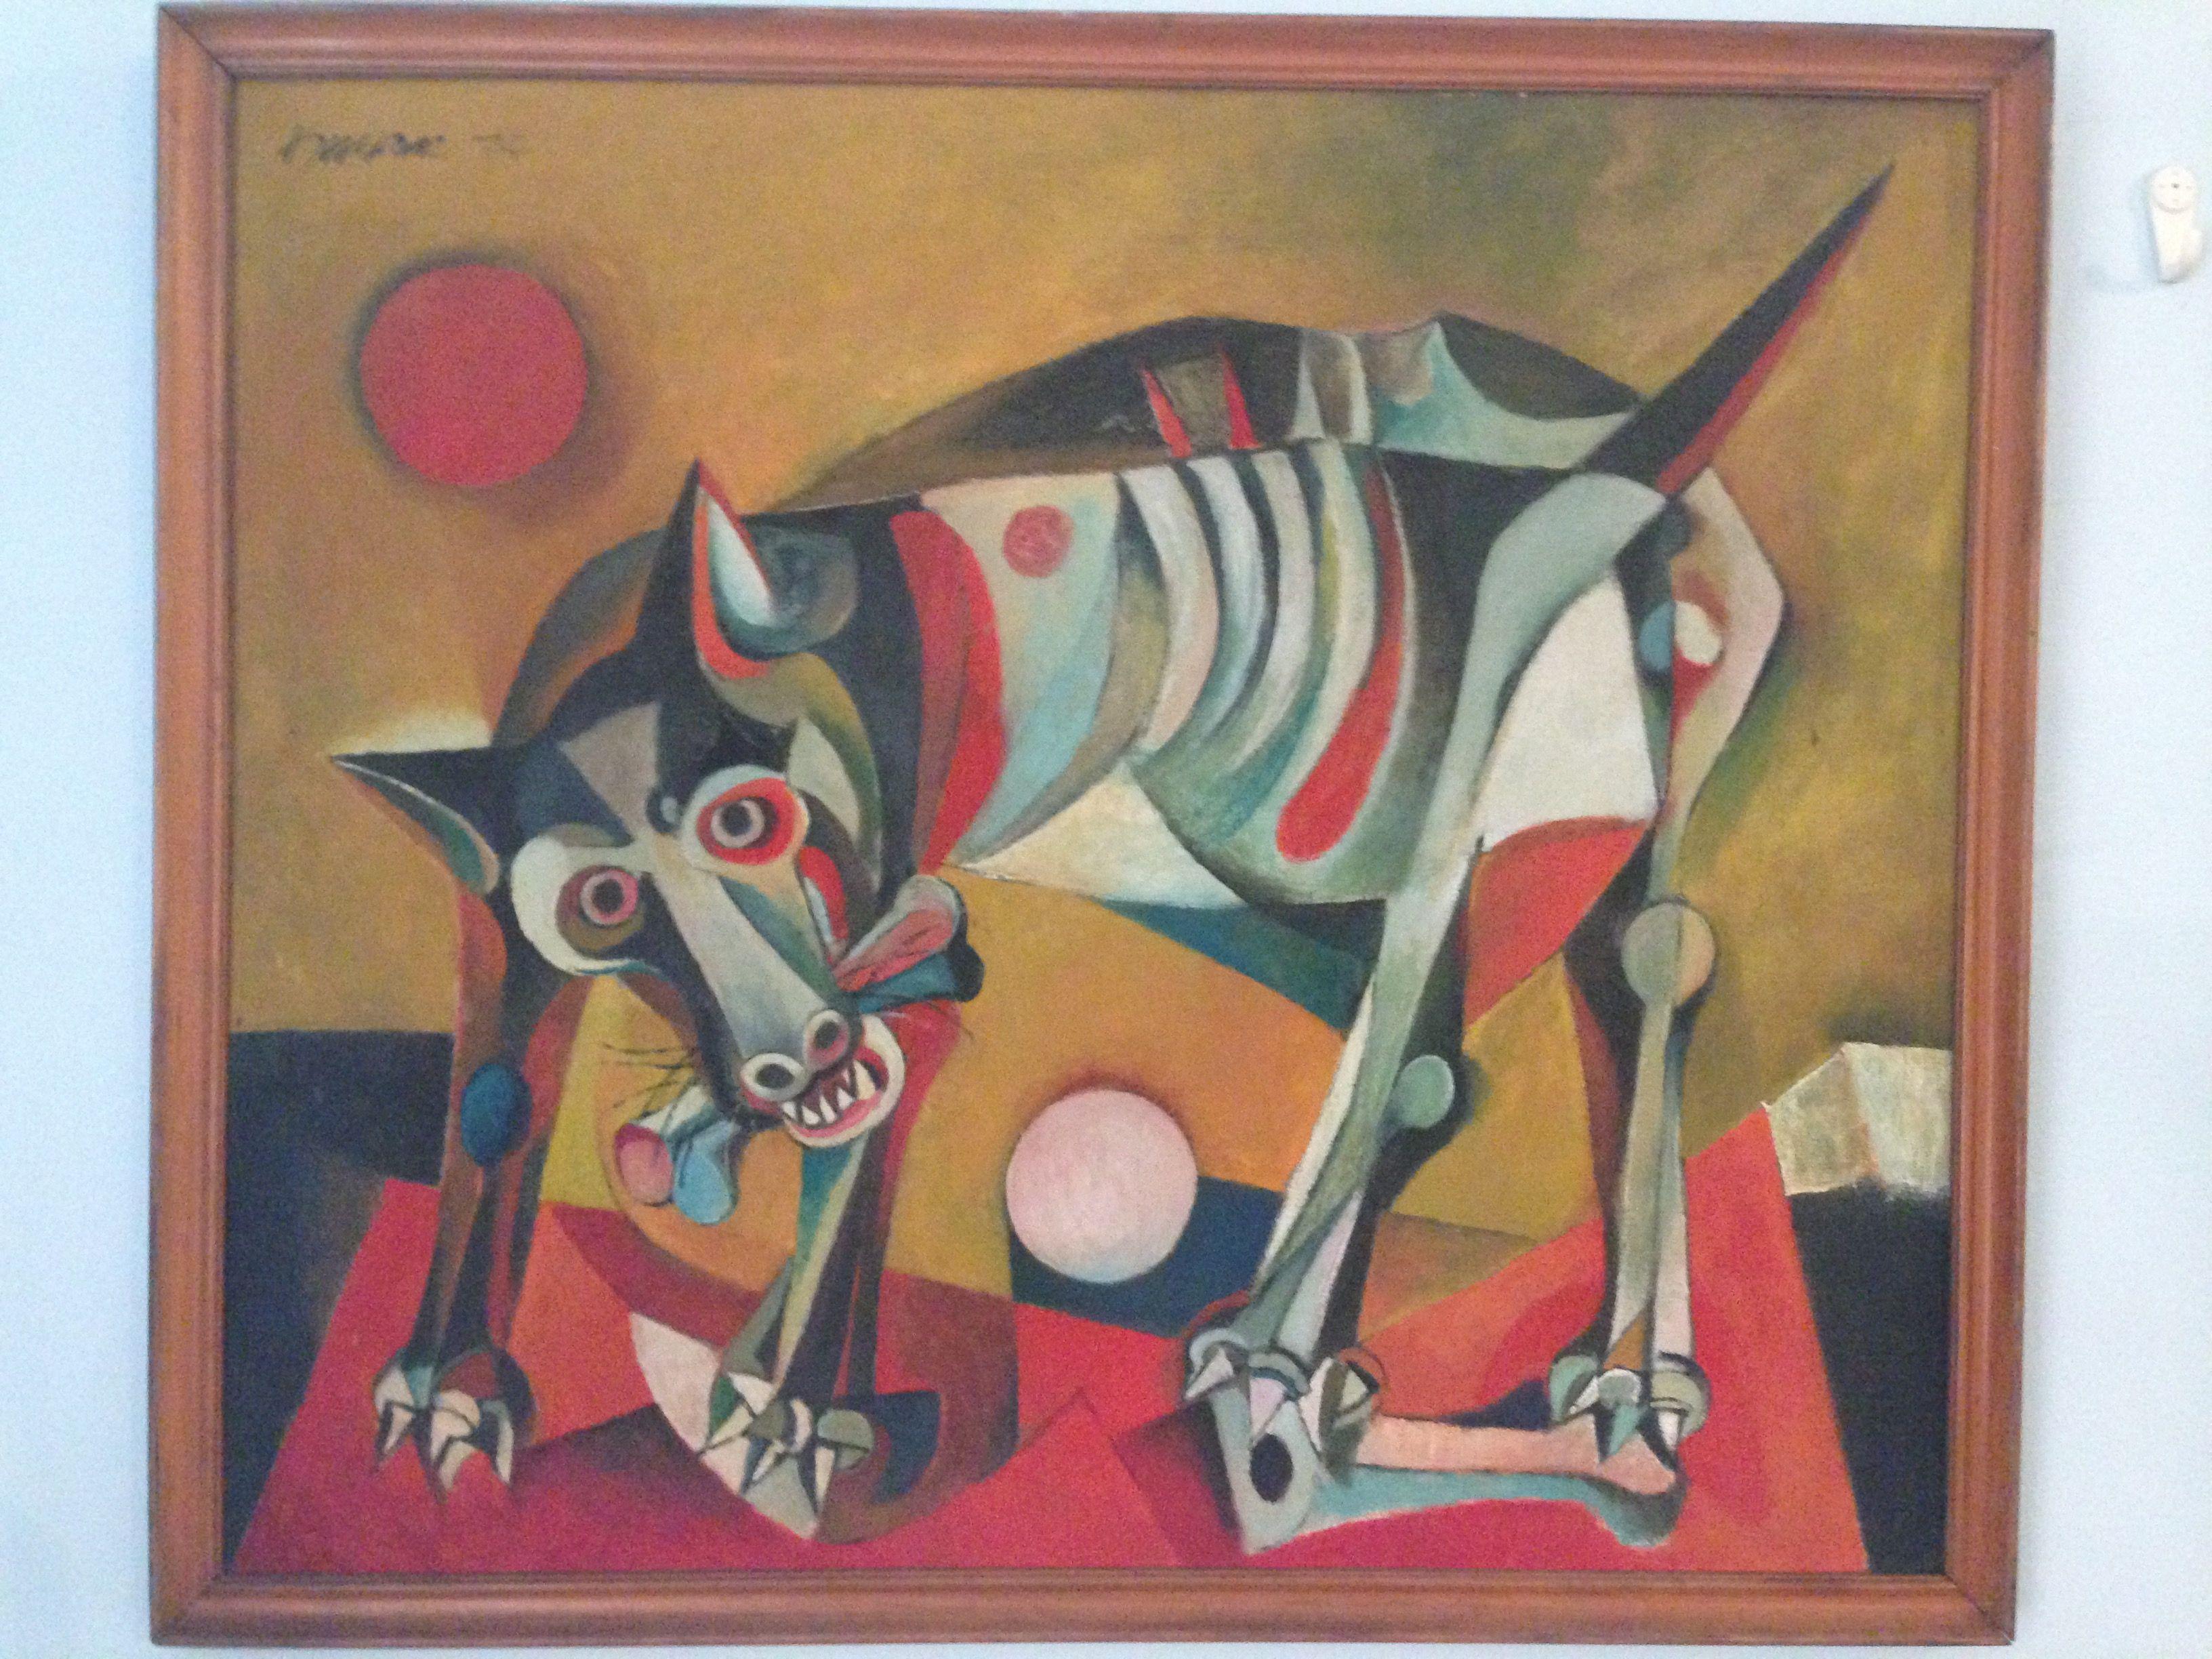 Ang Kiukok 1974 Dog Philippine art